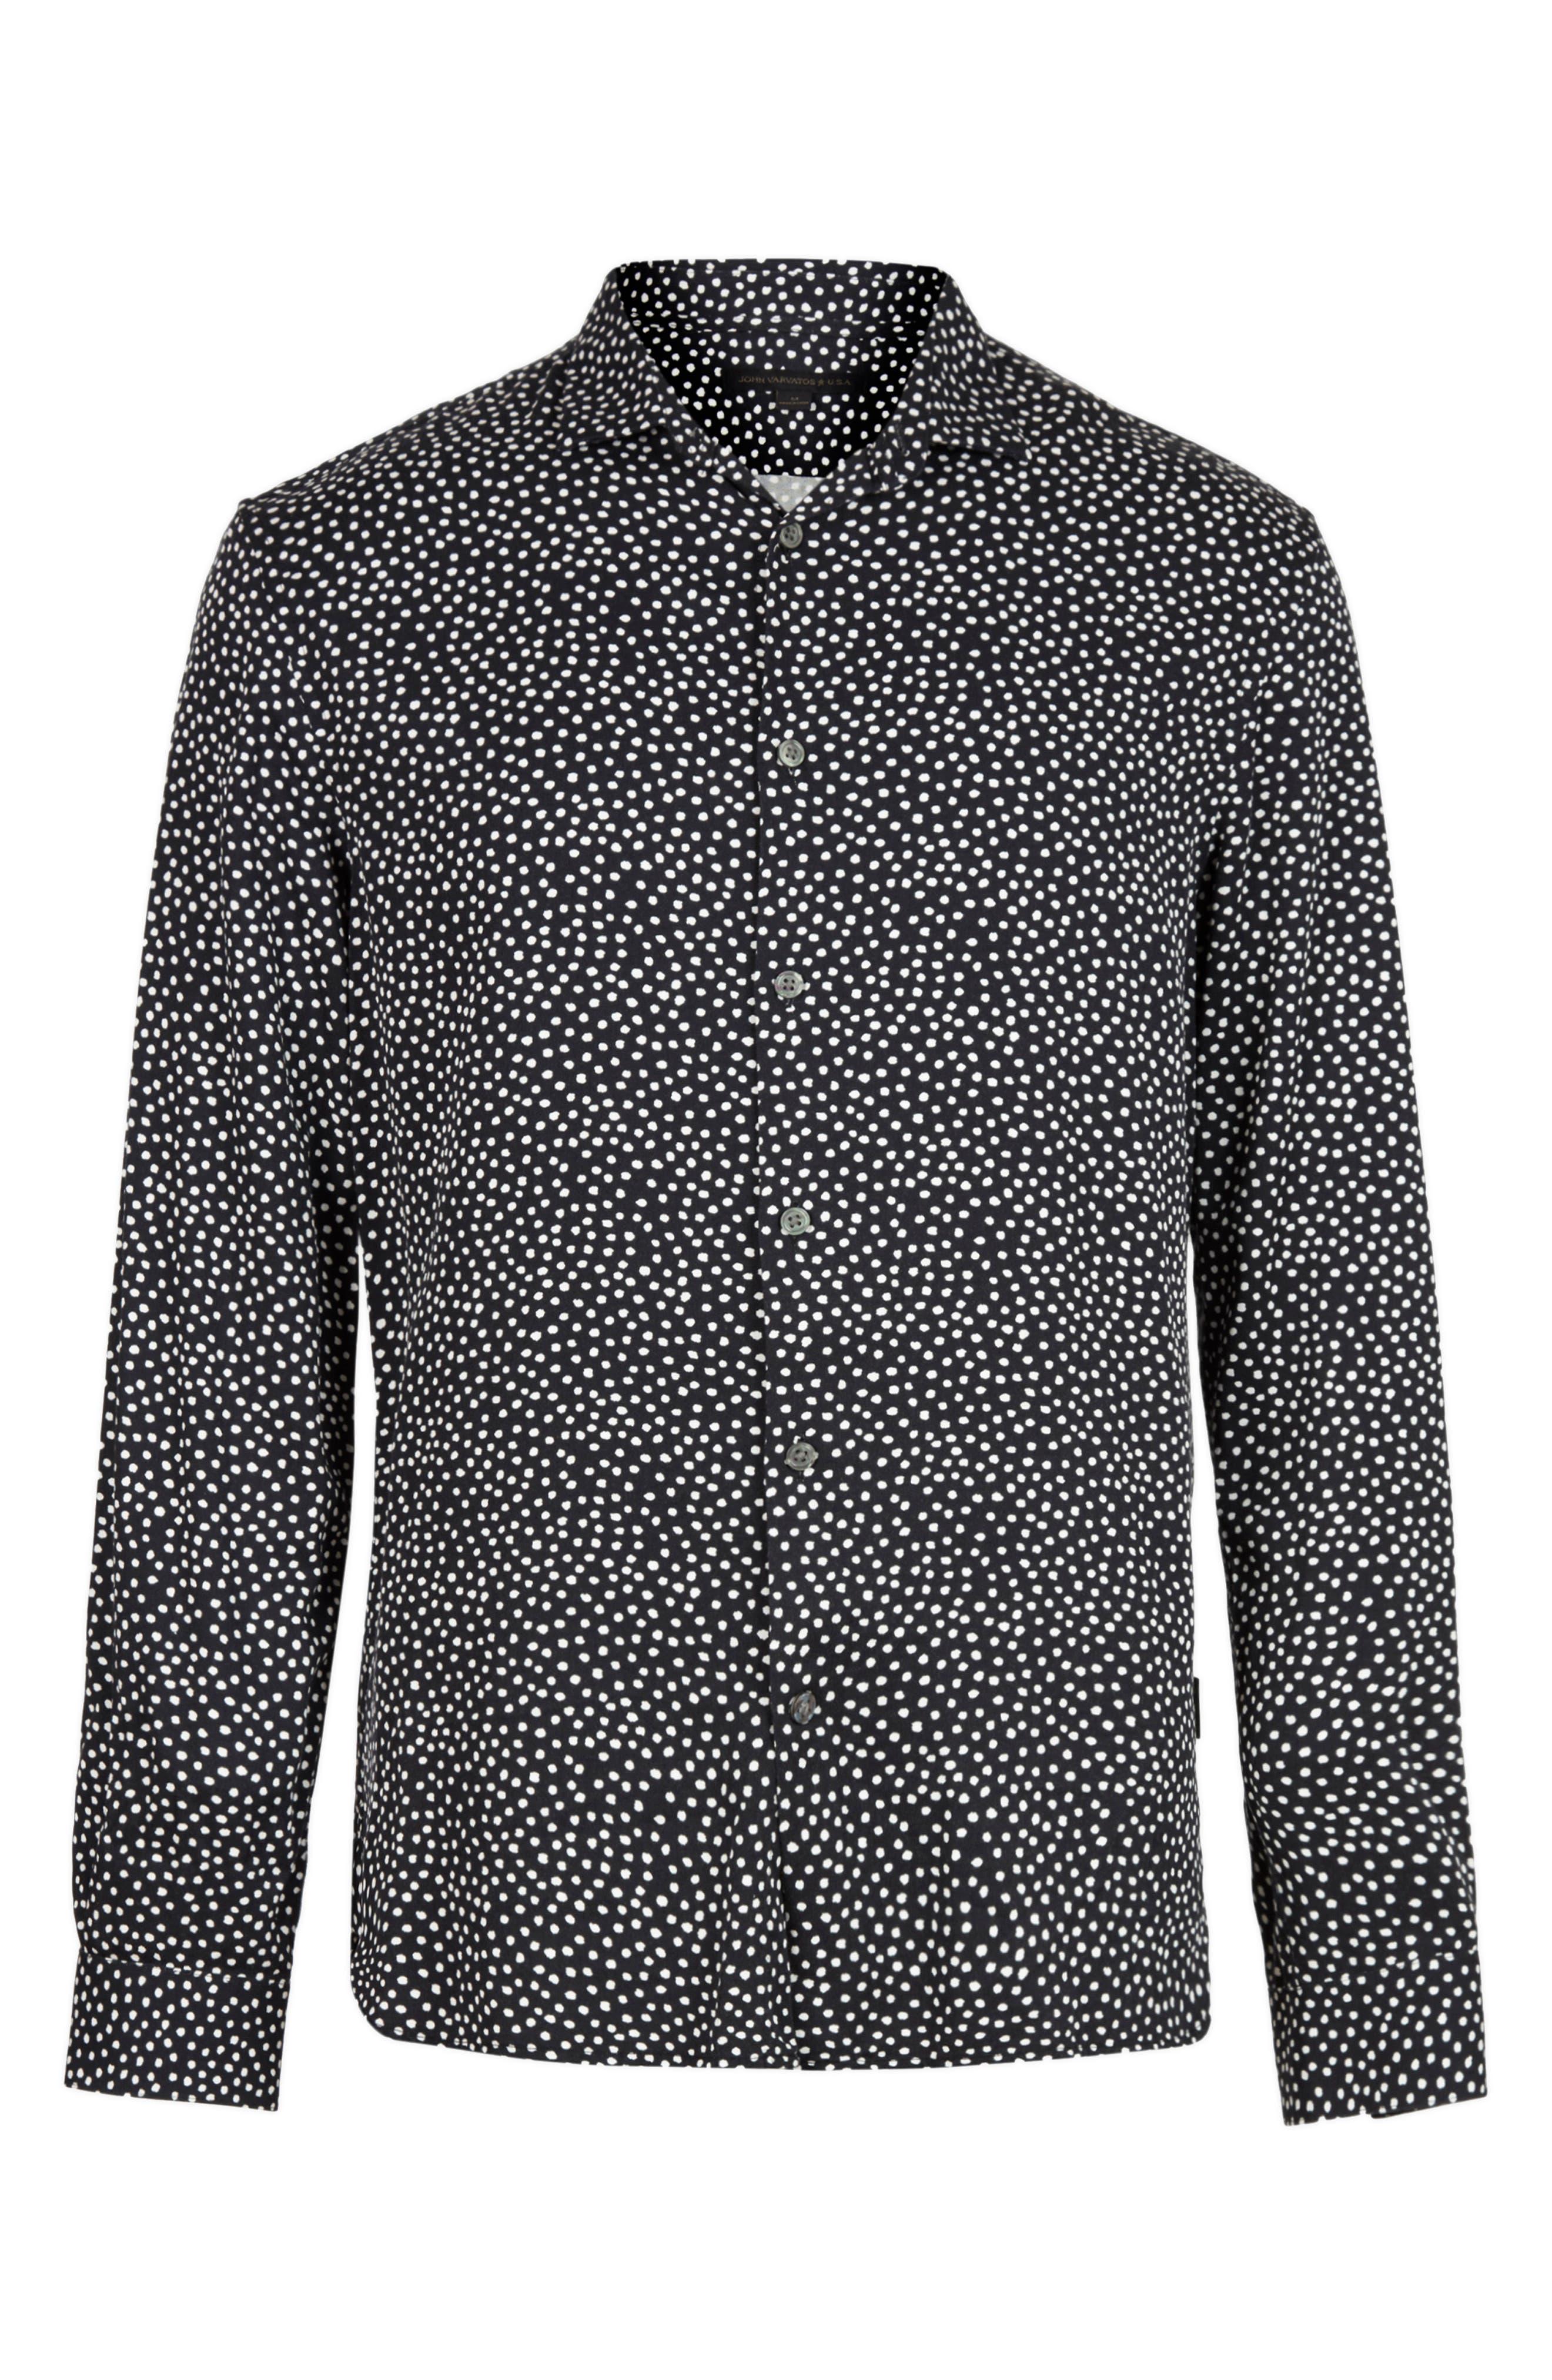 Ross Slim Fit Button-Up Shirt